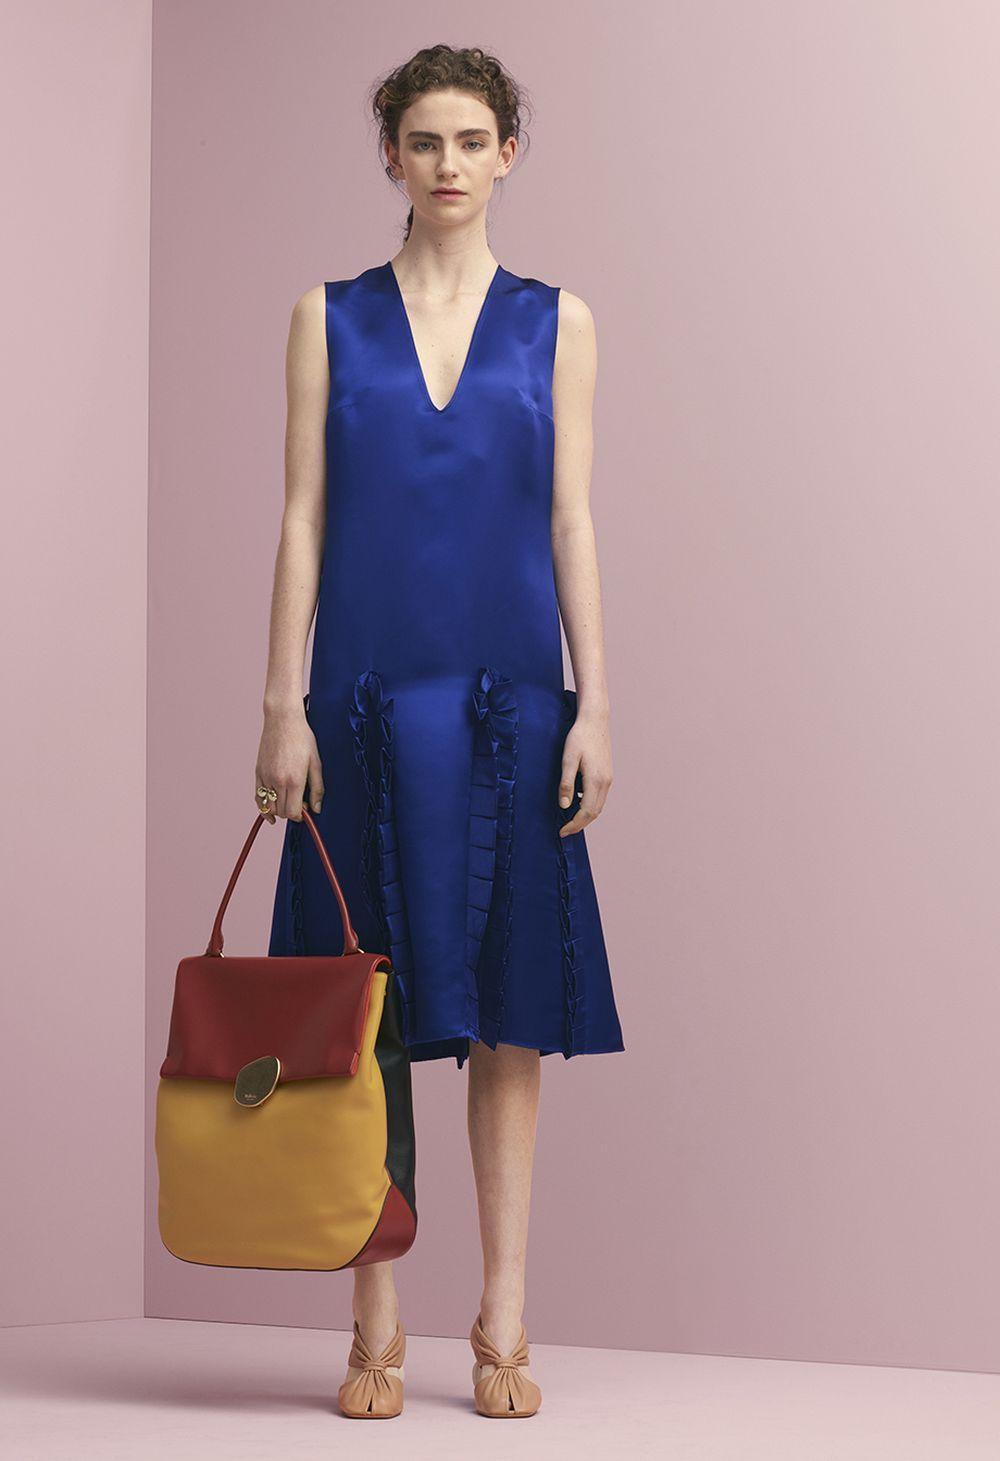 c2eecf19b9 Mulberry Summer  18 LFW show. Donna Dress in Indigo Glossy Viscose ...